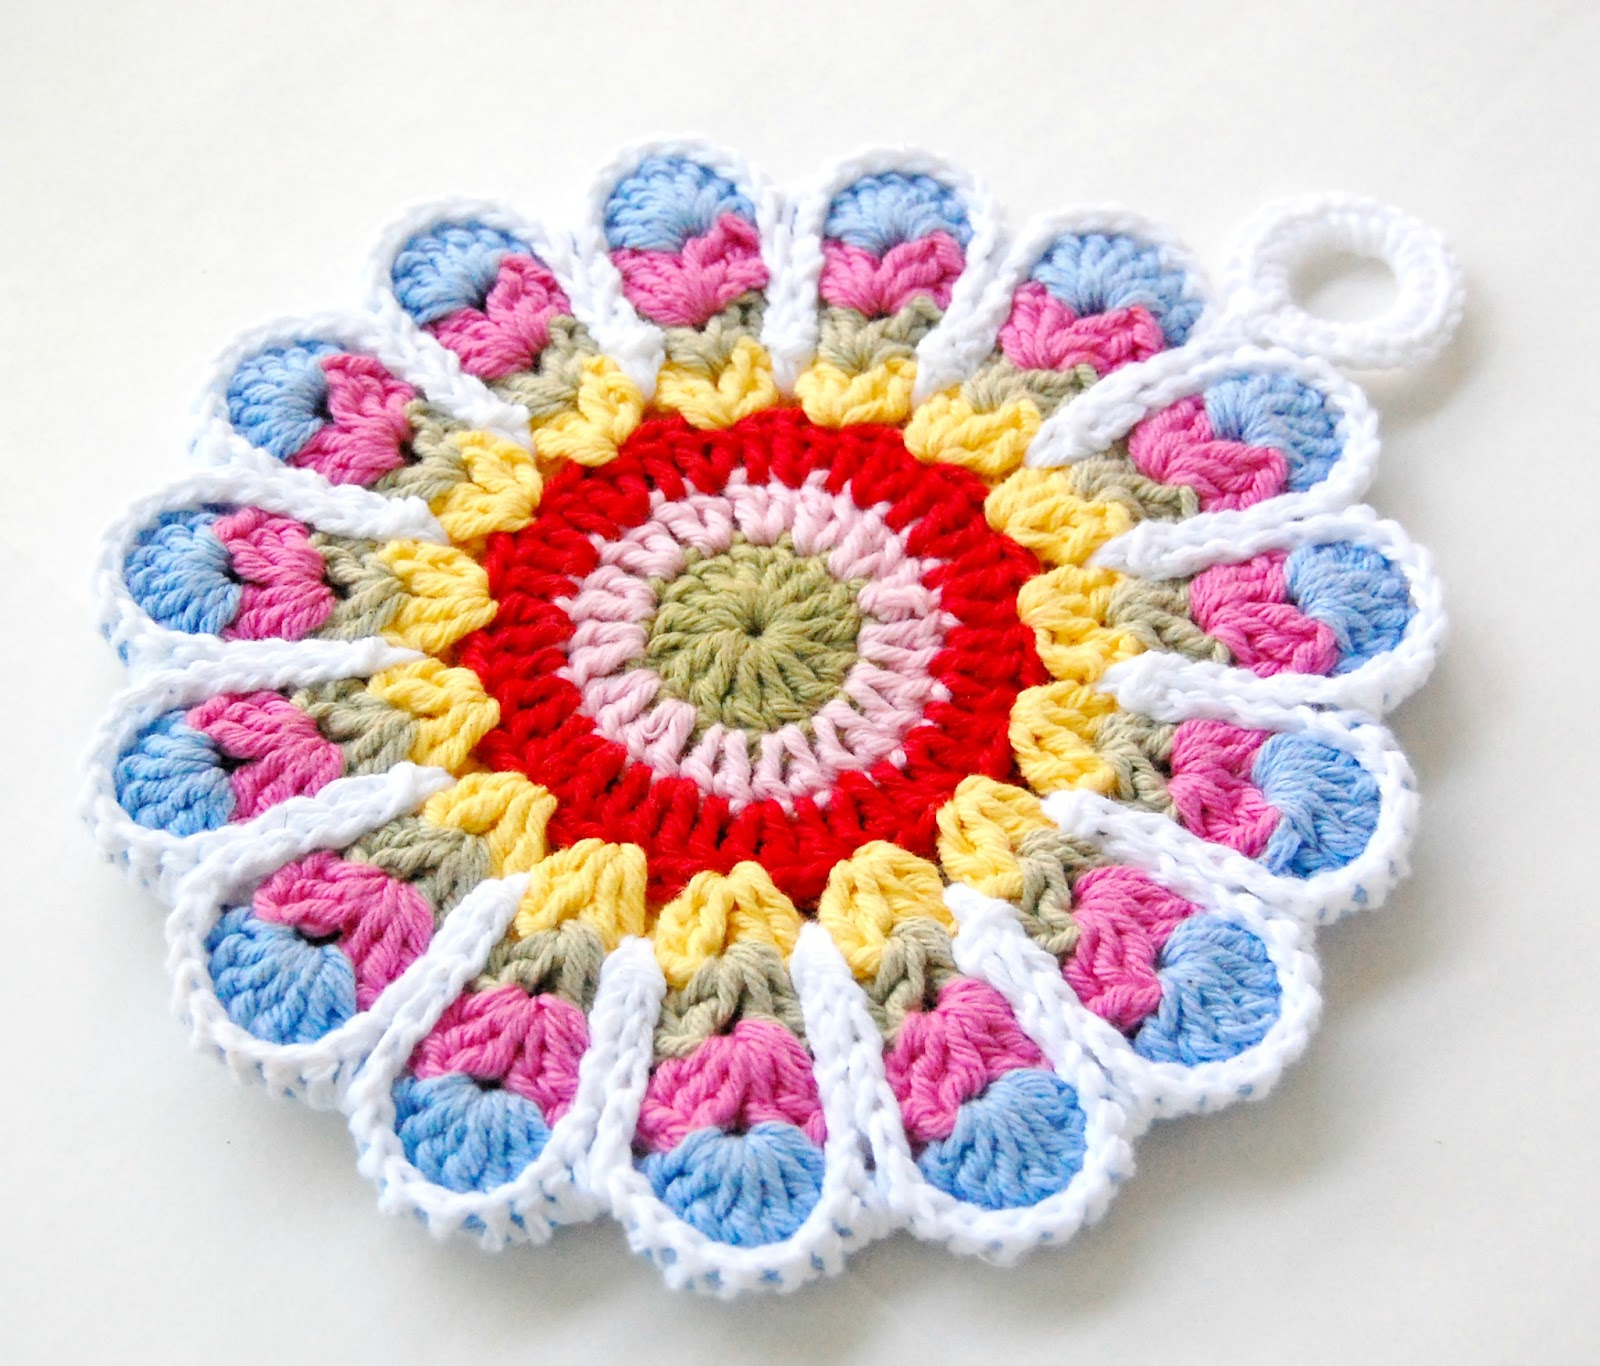 Crochet Flower Potholder Pattern : hopscotch lane: Two Potholders